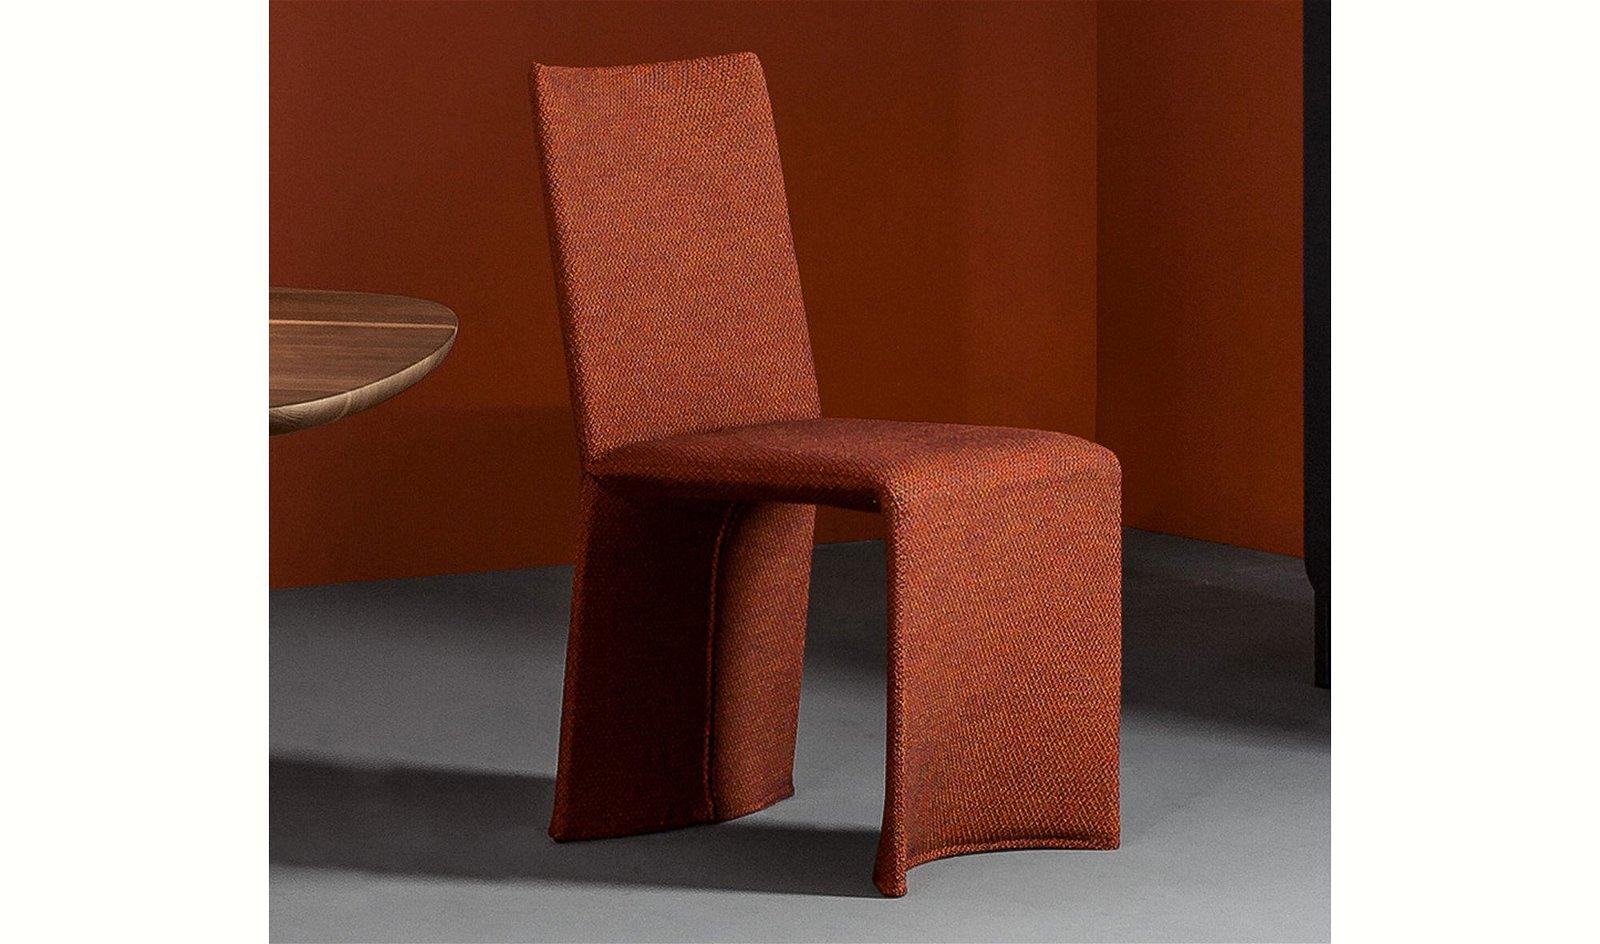 Silla tapizada moderna Ketch Bonaldo